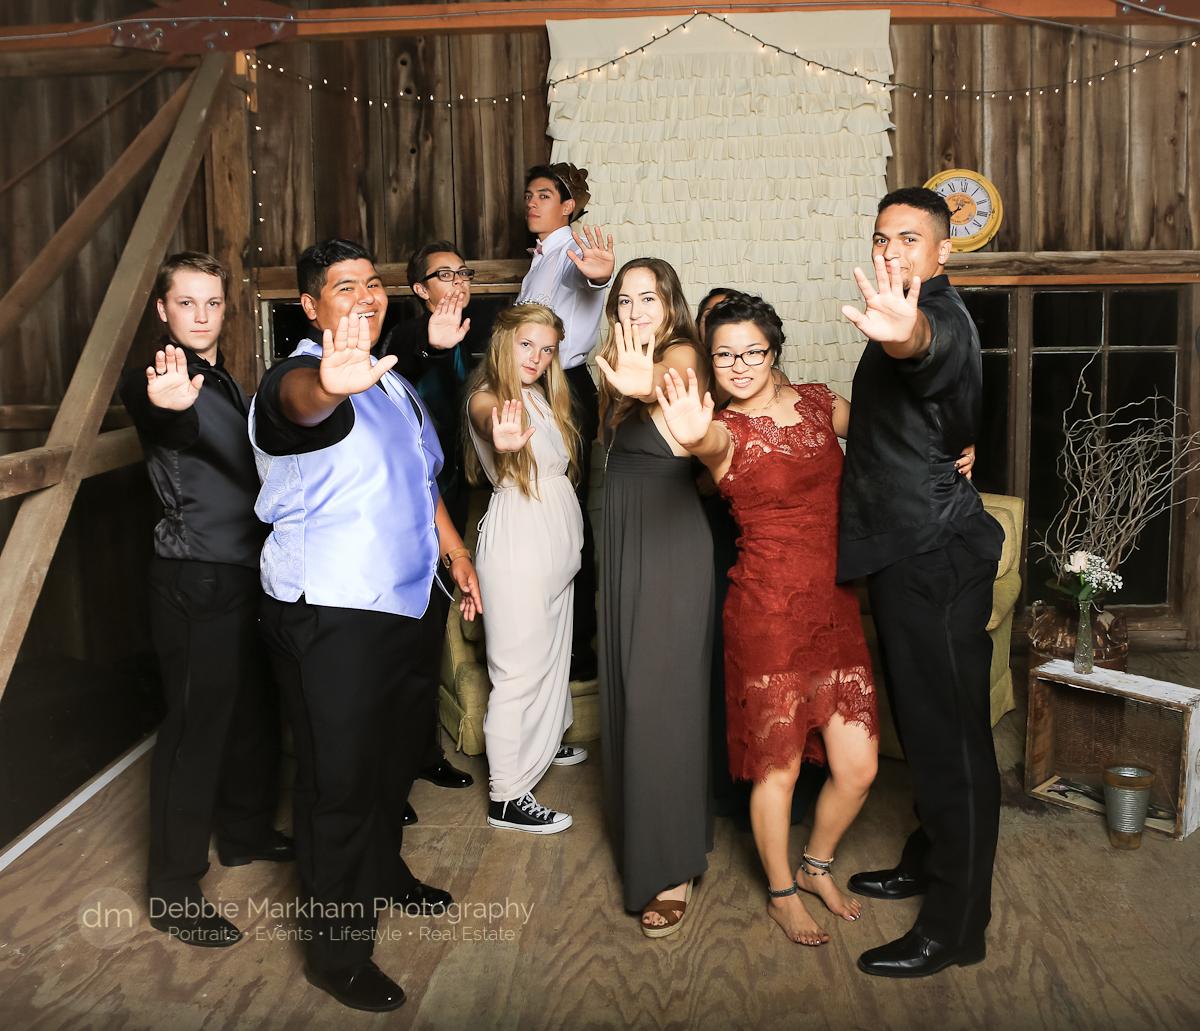 high-school-prom_event-photographer_cambria_morro-bay_san-luis-obispo_local_fun_prom-photos-4251